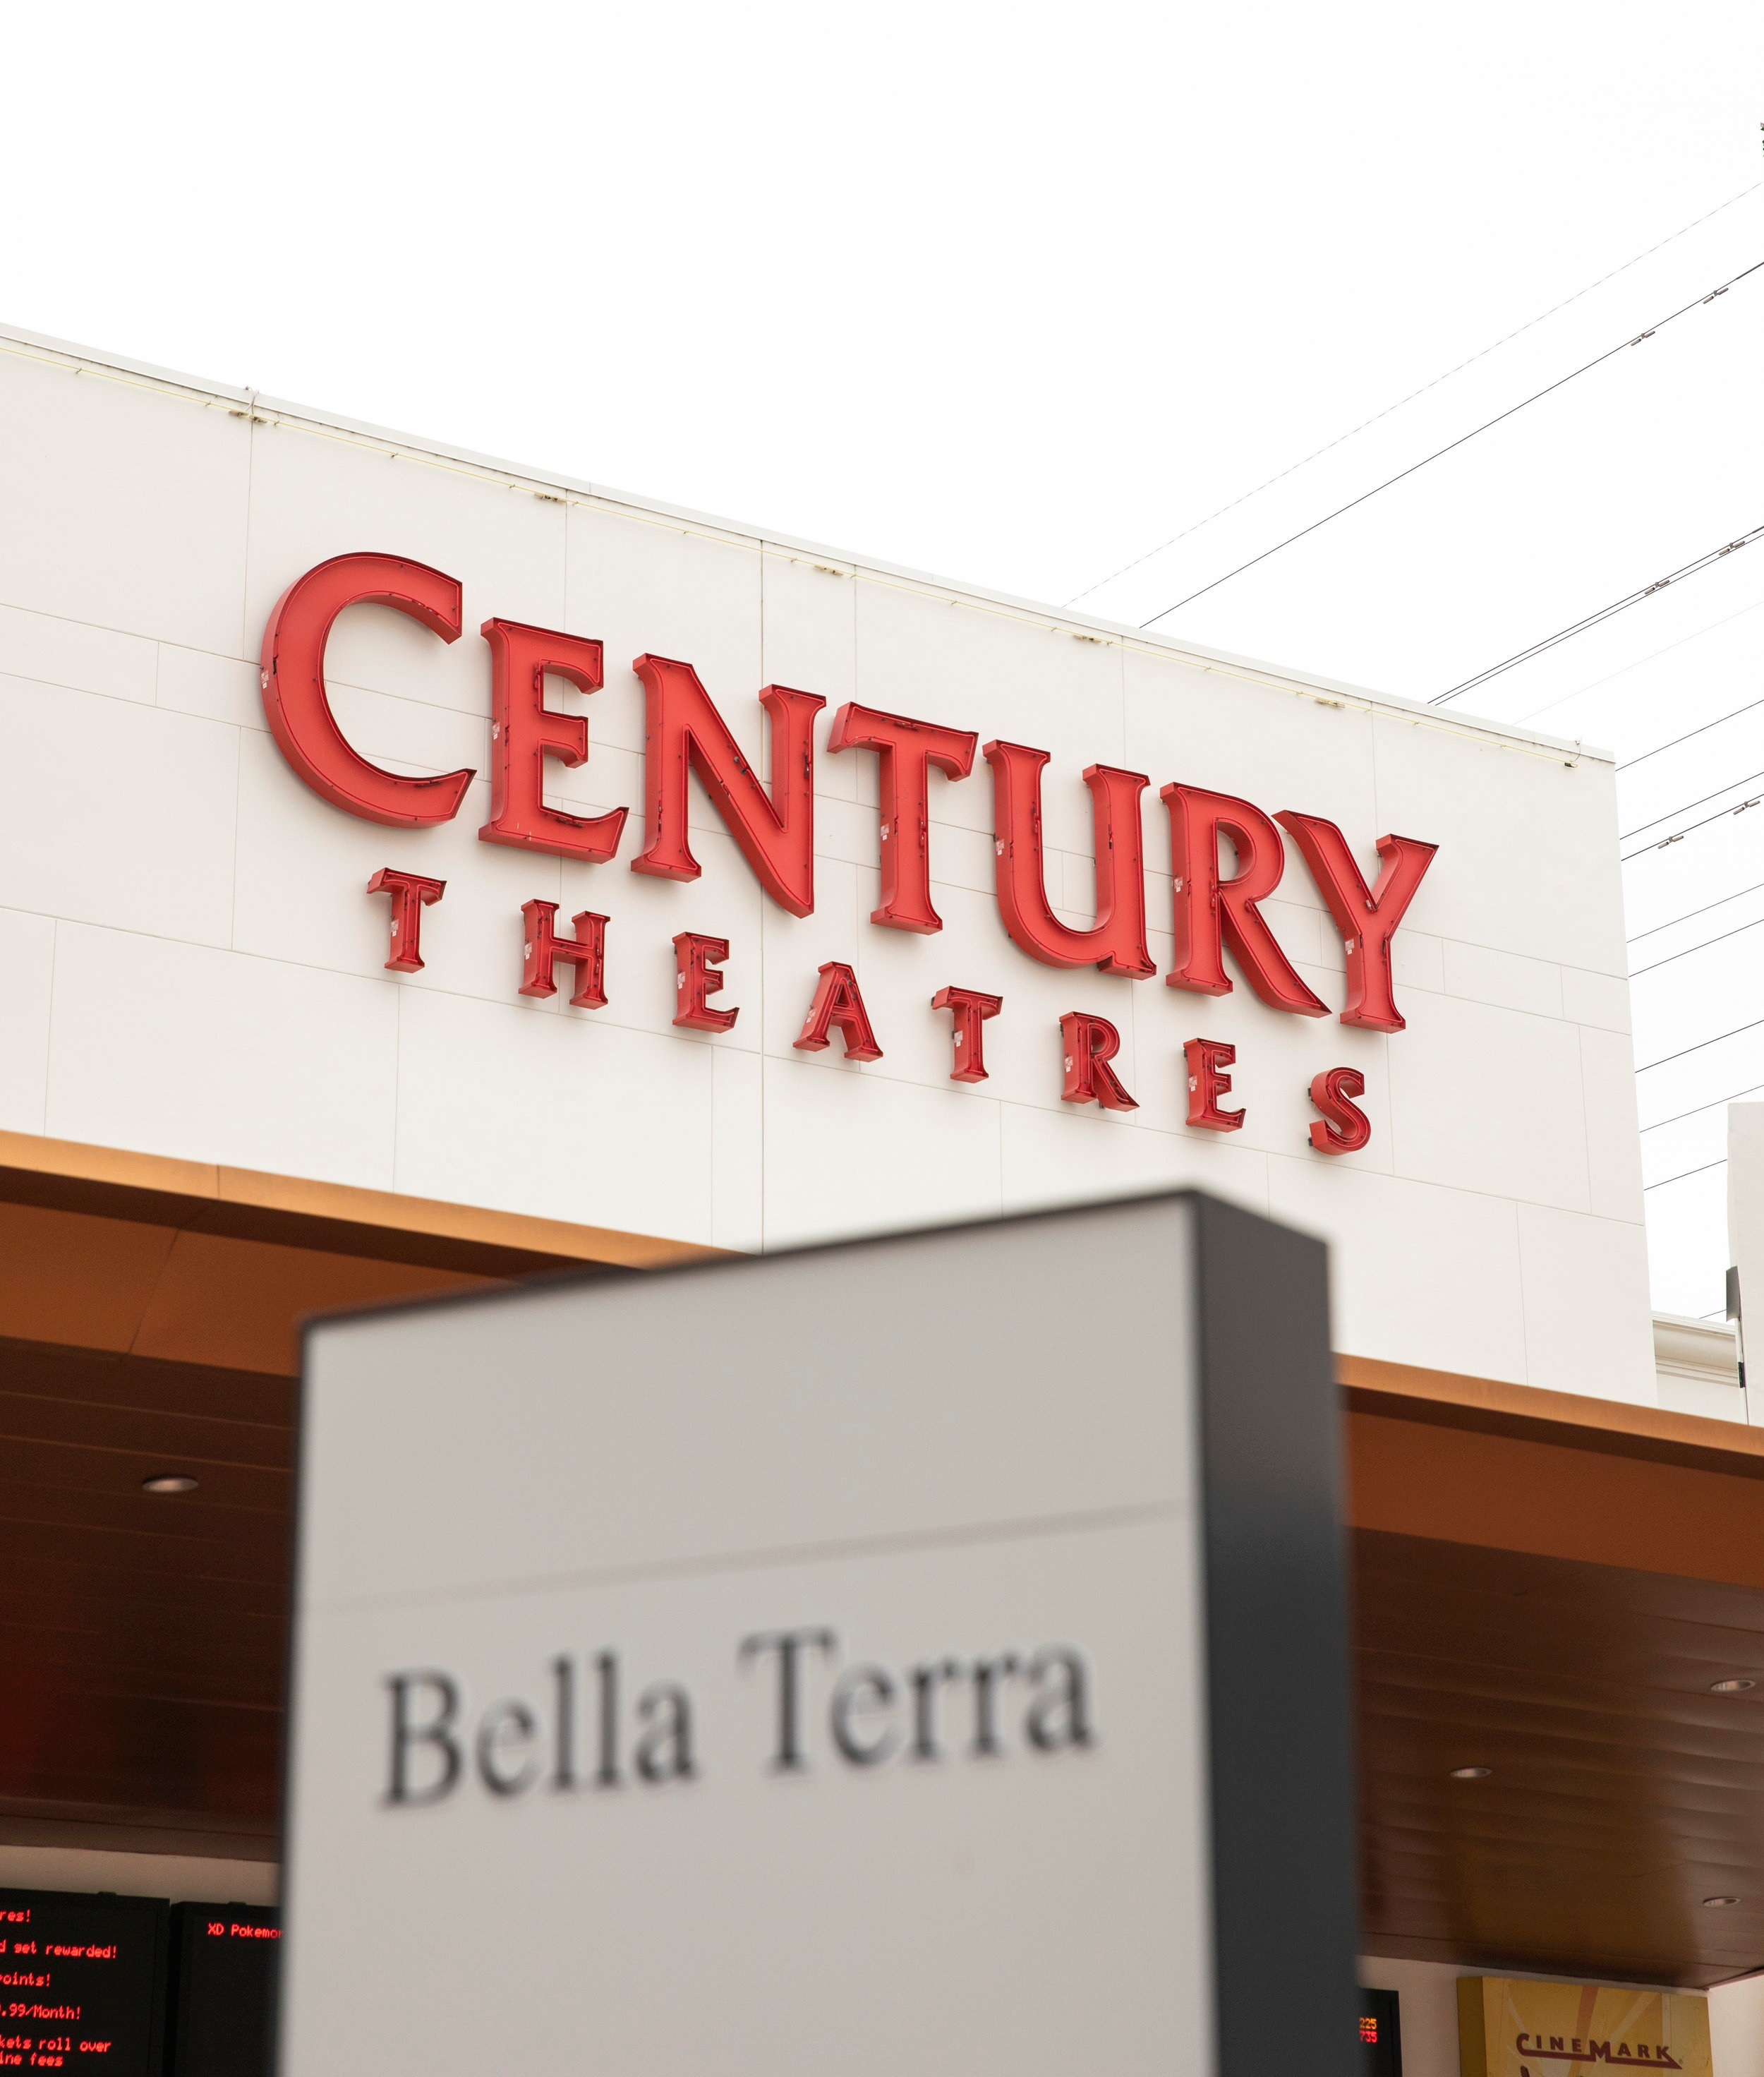 CenturyTheatrs_Bella_Terra.jpg